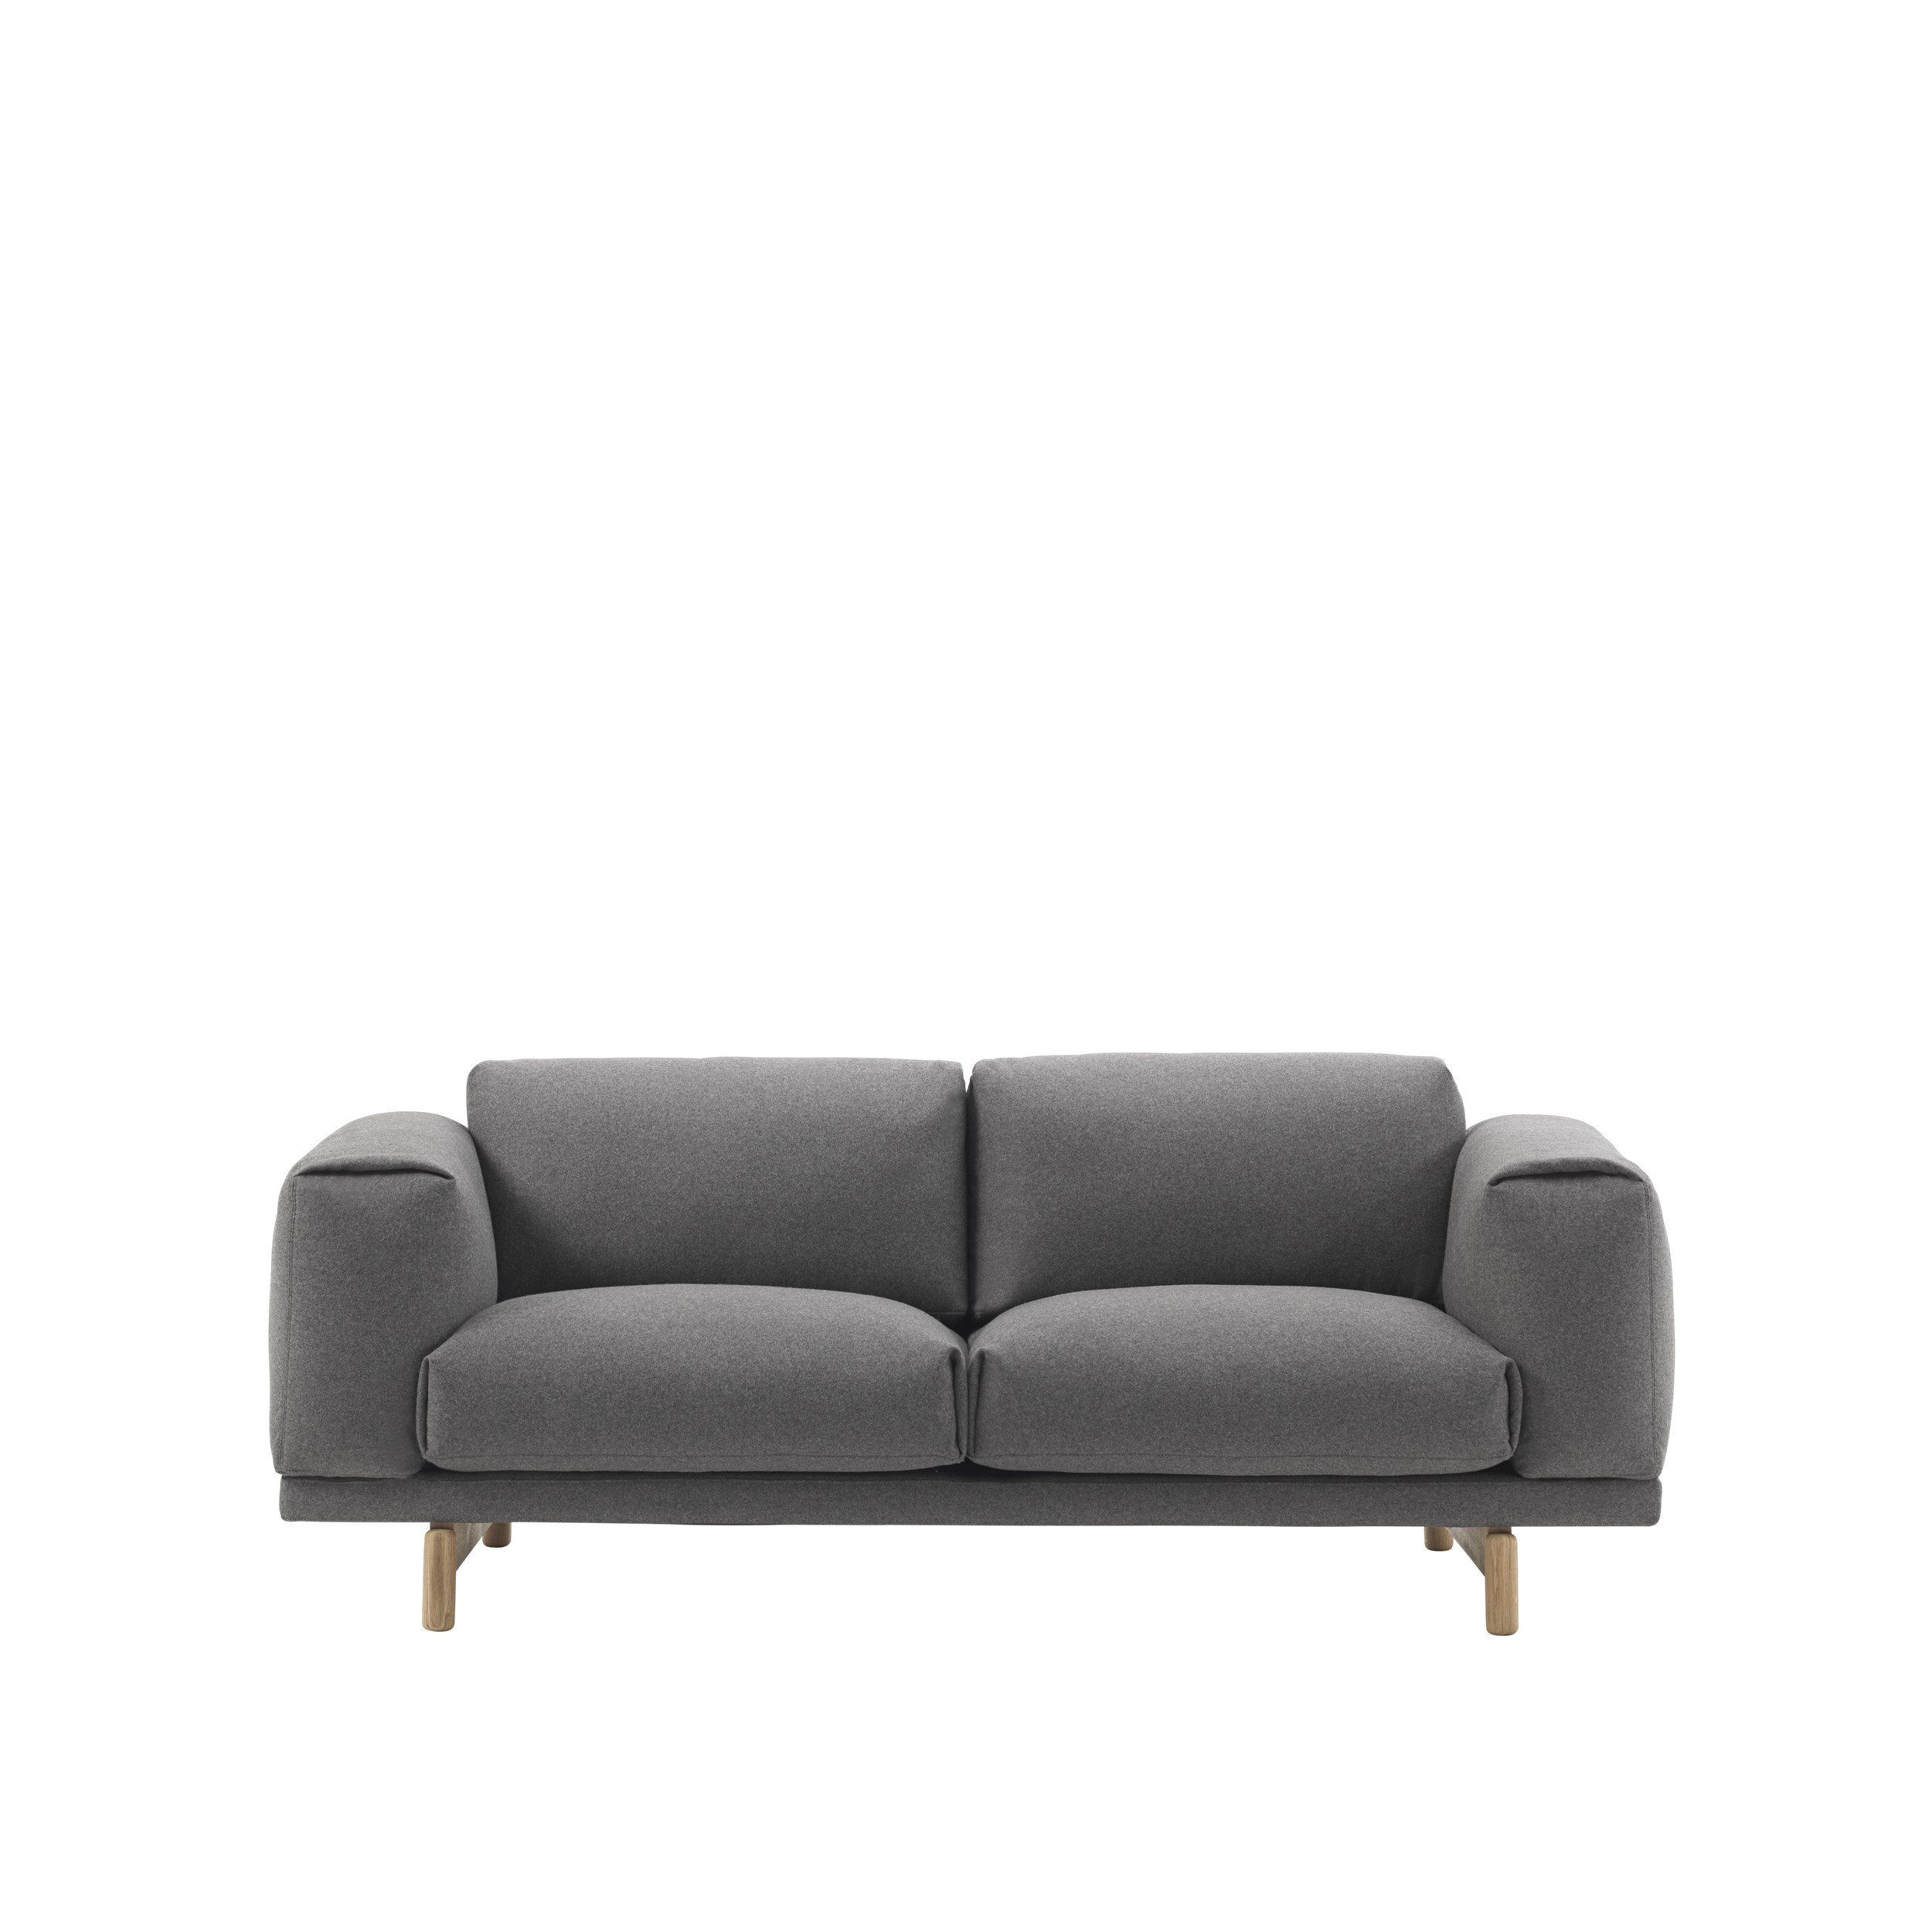 Rest Sofa 2 Seater